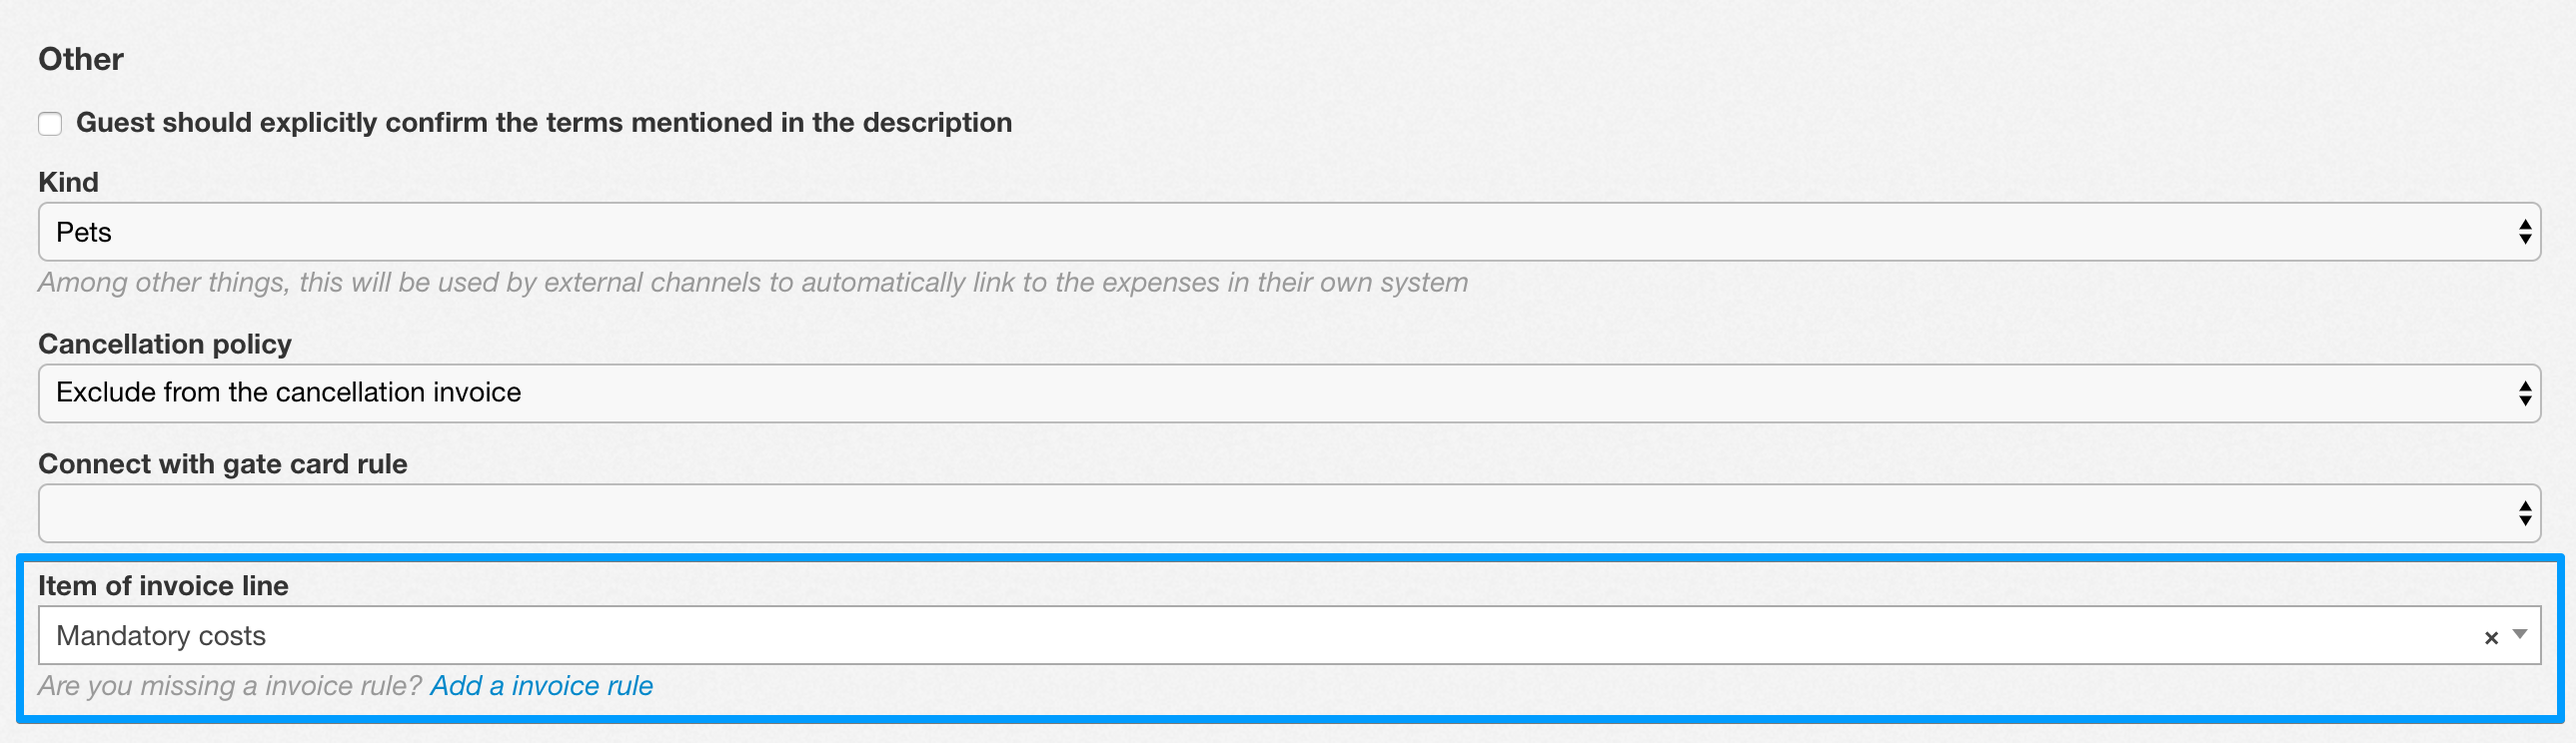 Merge cost on invoice line